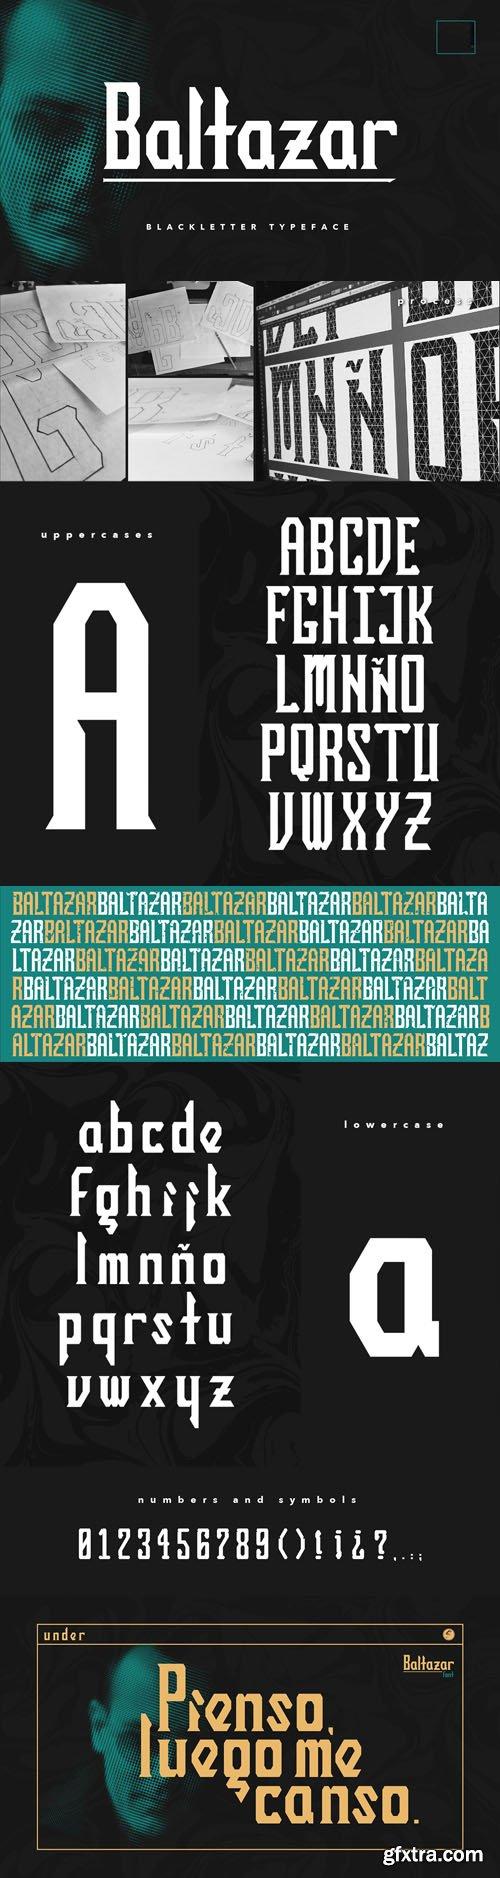 BALTAZAR Blackletter Typeface